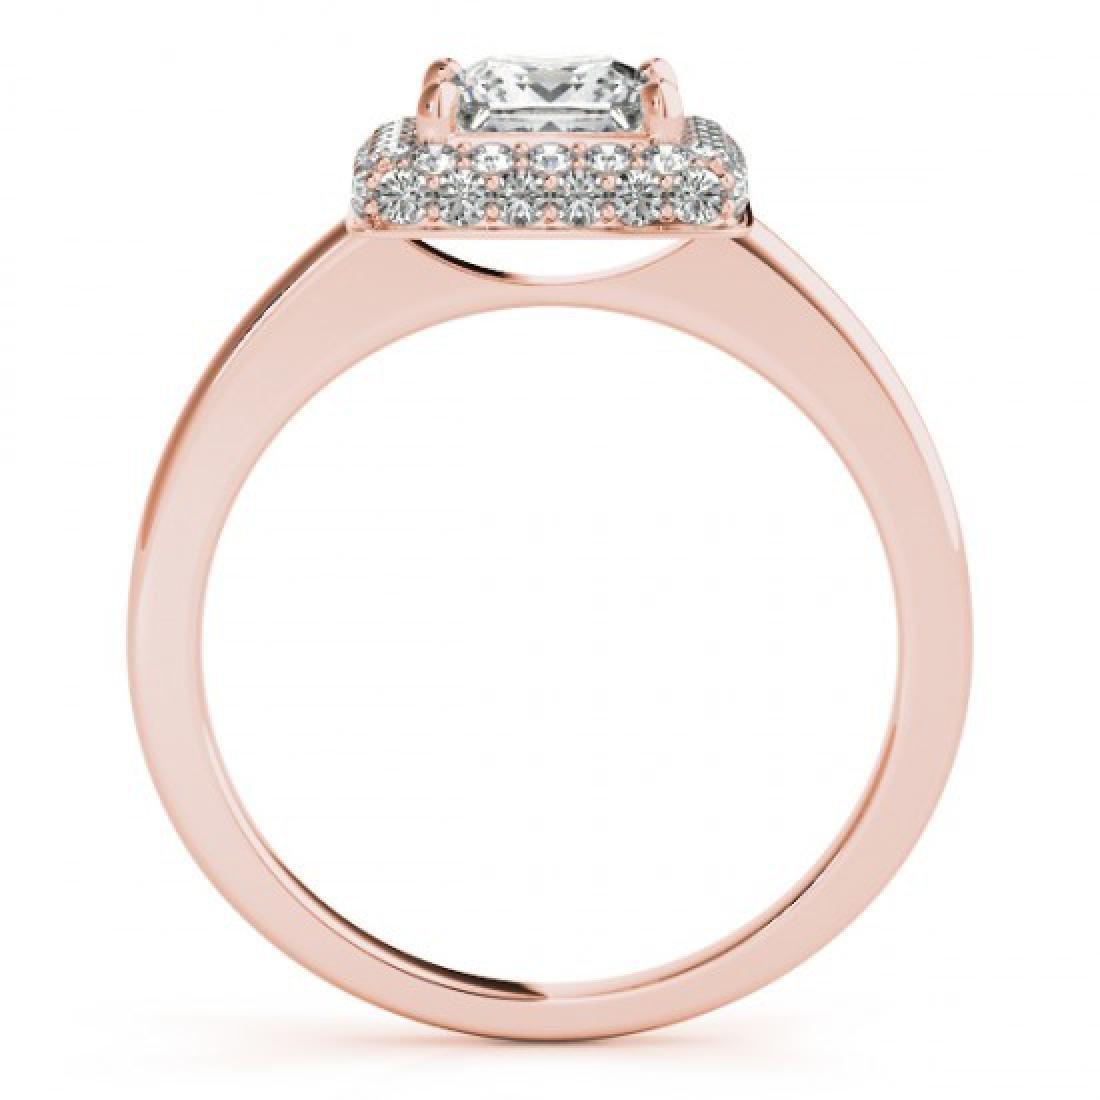 0.8 CTW Certified VS/SI Princess Diamond Solitaire Halo